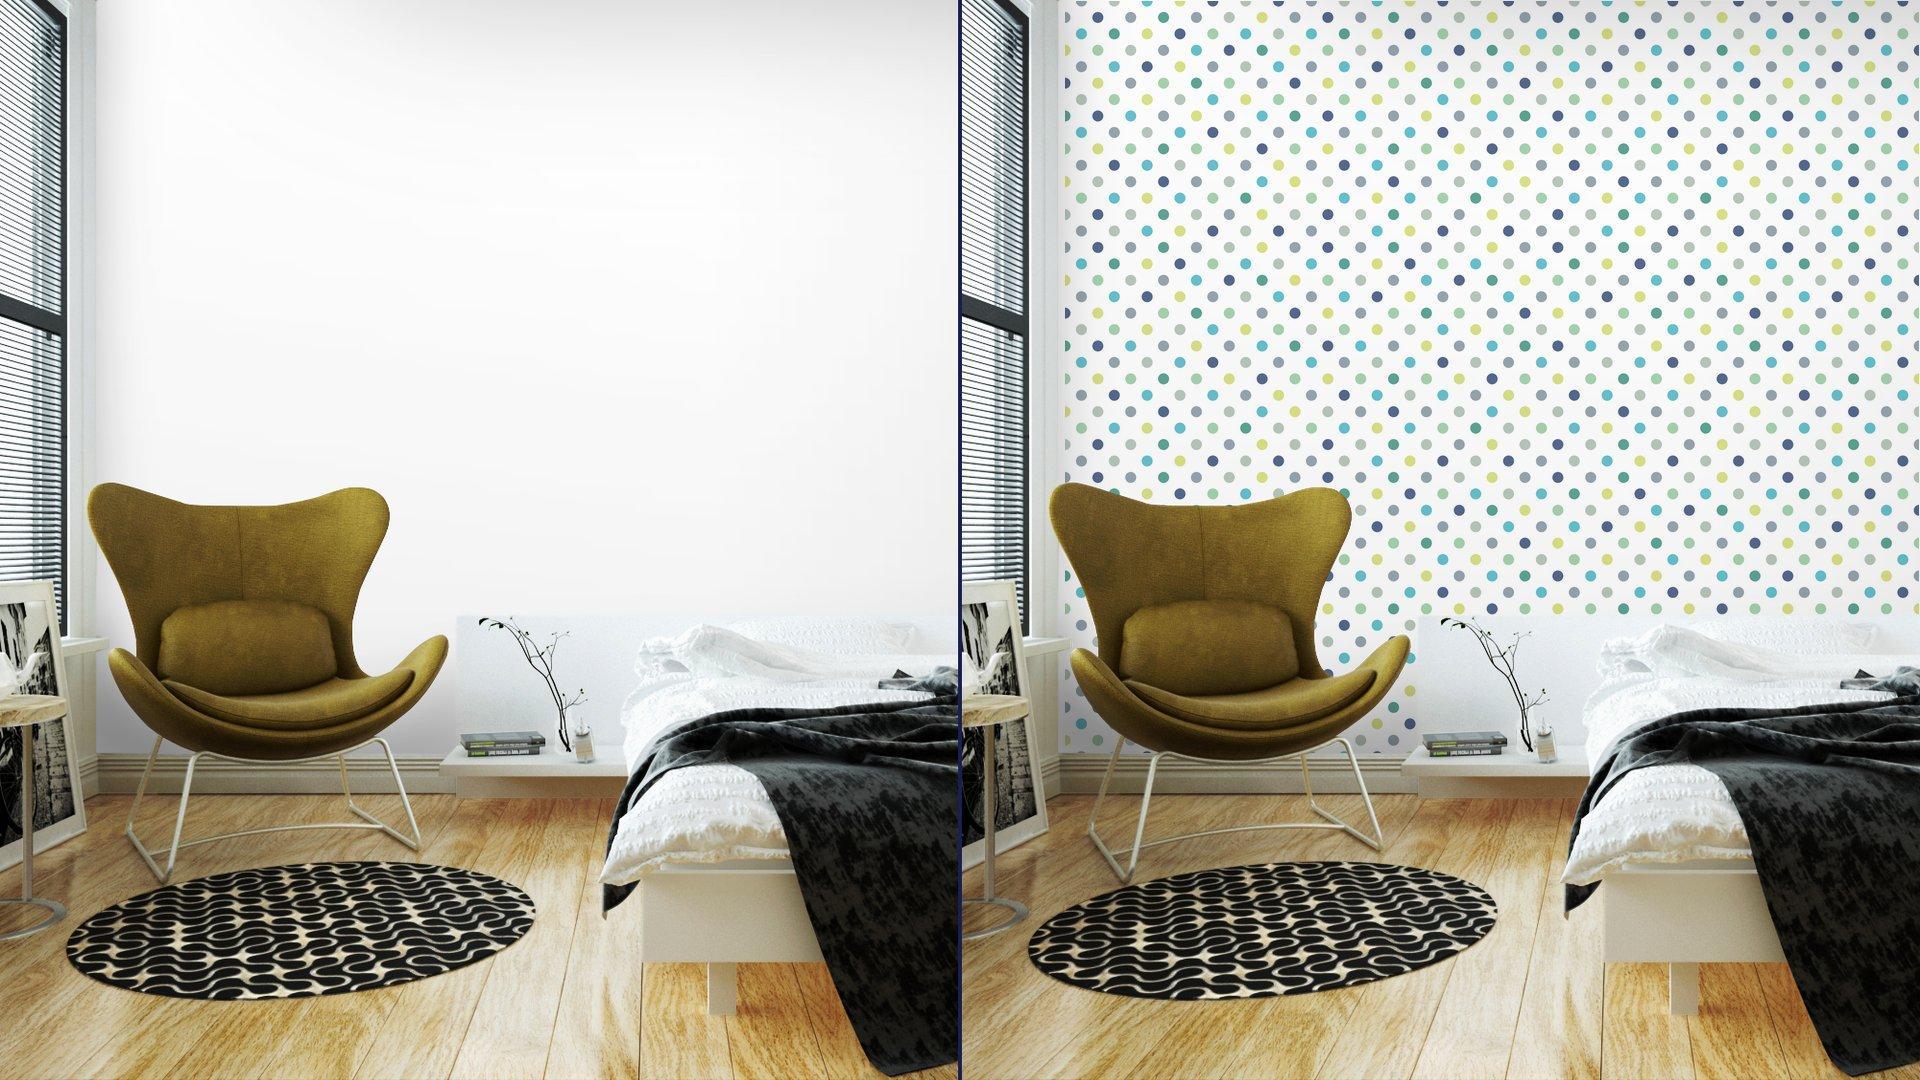 Fotomurales mexico papeles pintados lavables puntos vector patron de fondo sin fisuras lunares de colores 2 - Papel Tapiz Lunares de Colores Fondo Blanco 01